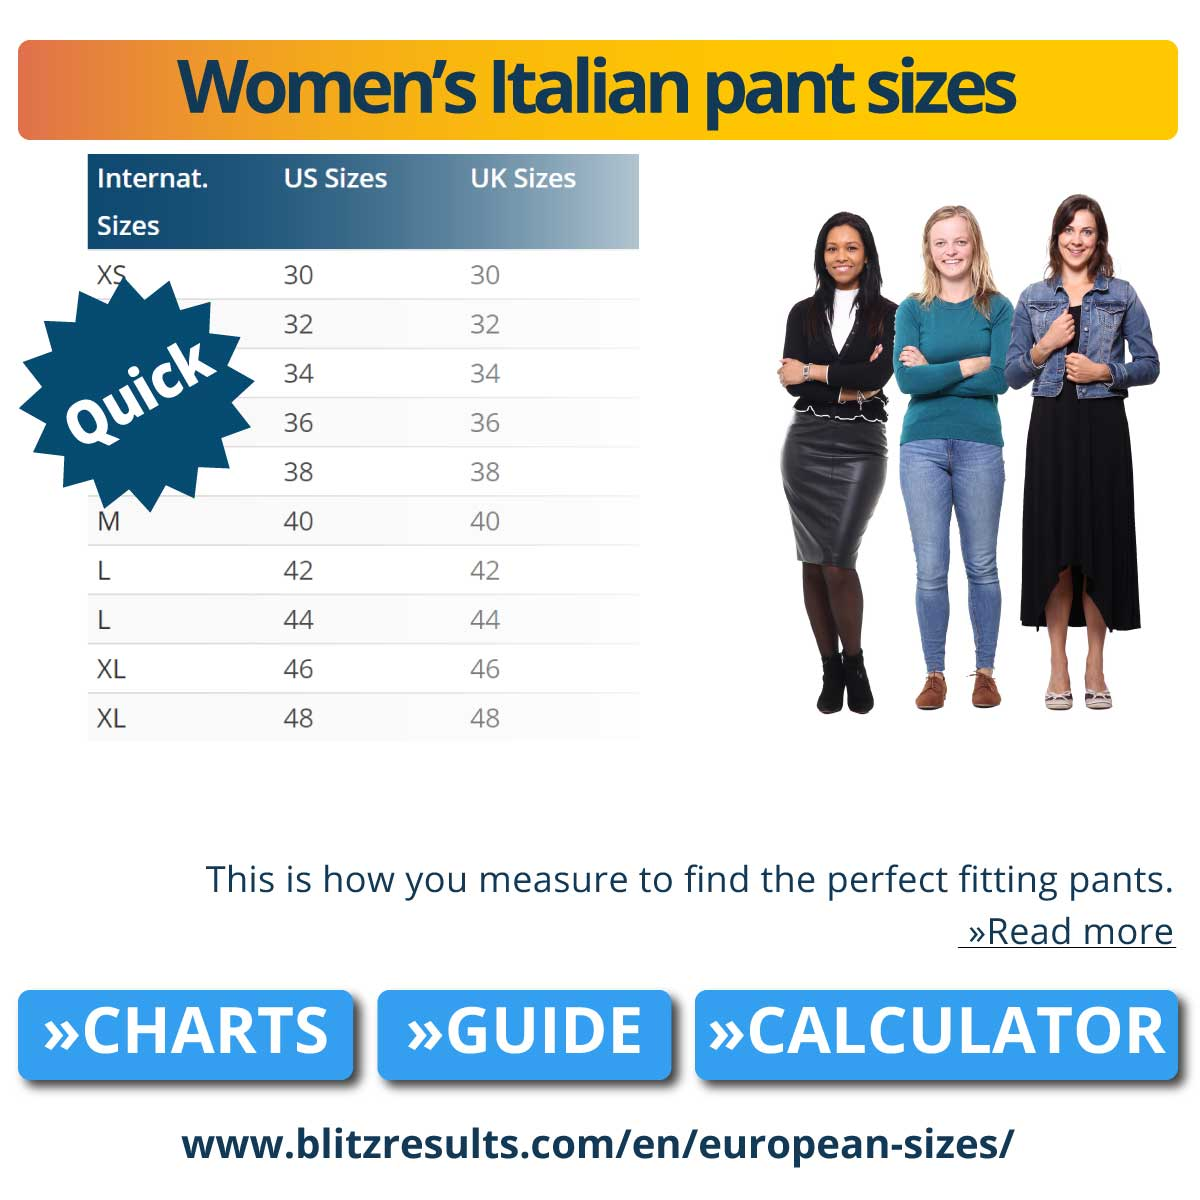 Women'sItalian pant sizes